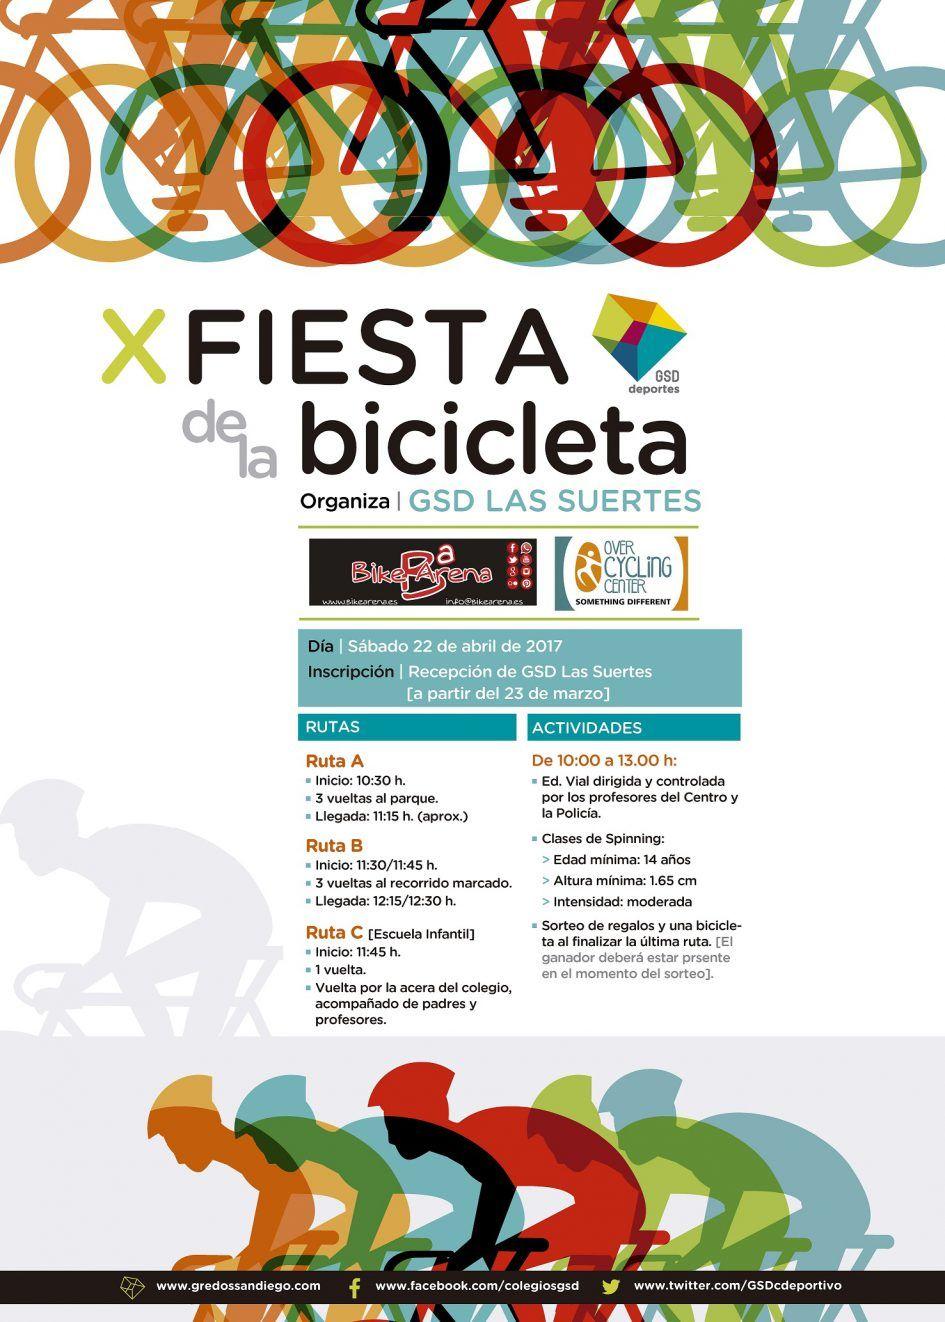 FiestaBicicletaGSDSuertes